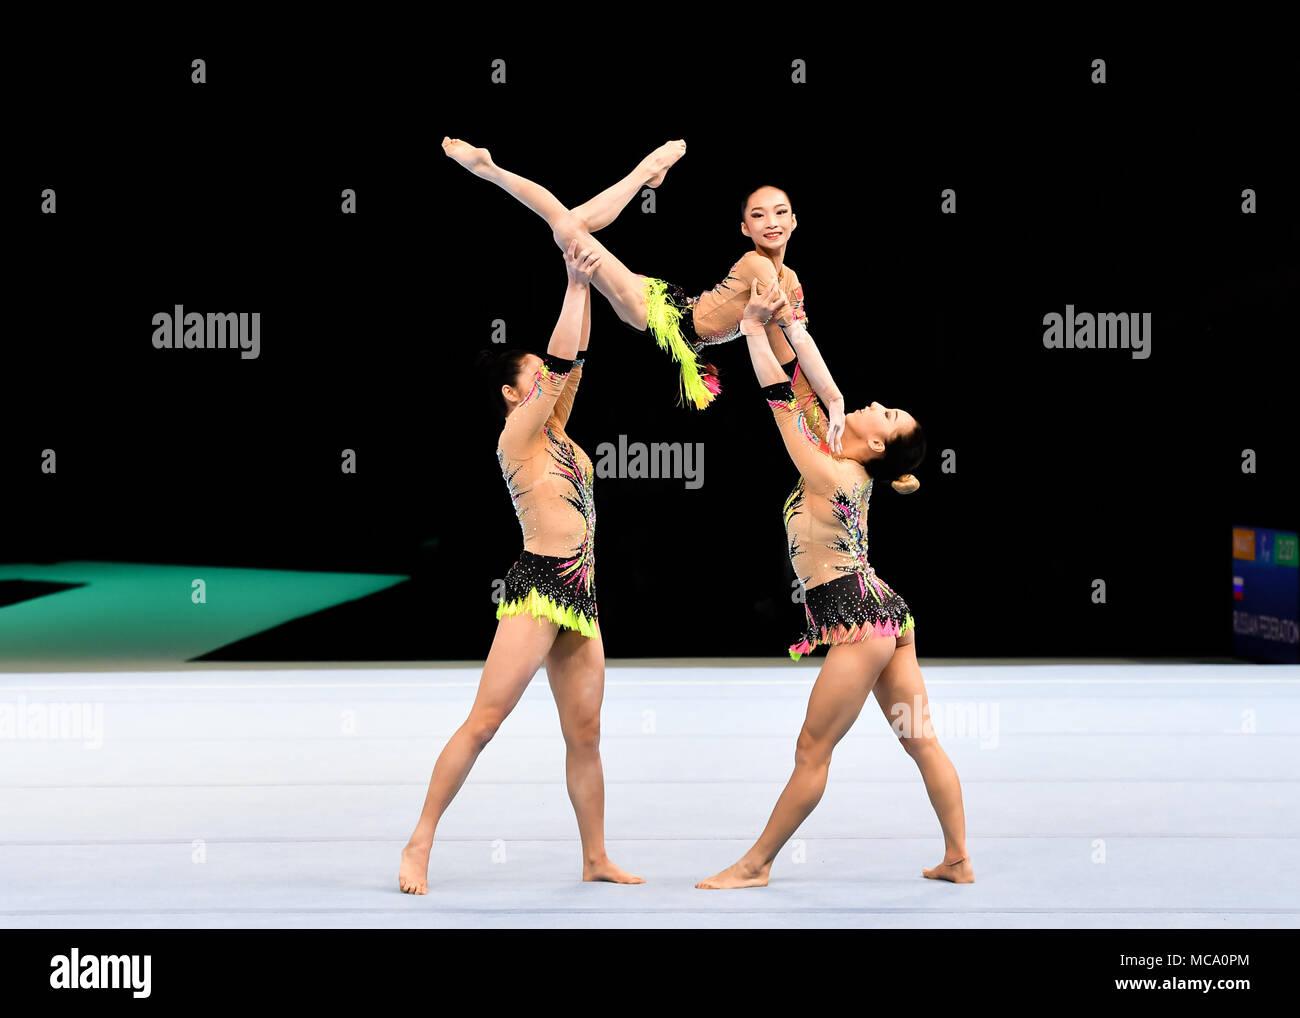 Antwerp, Belgium, 14 April 2018  The Chinese Women's Team performs